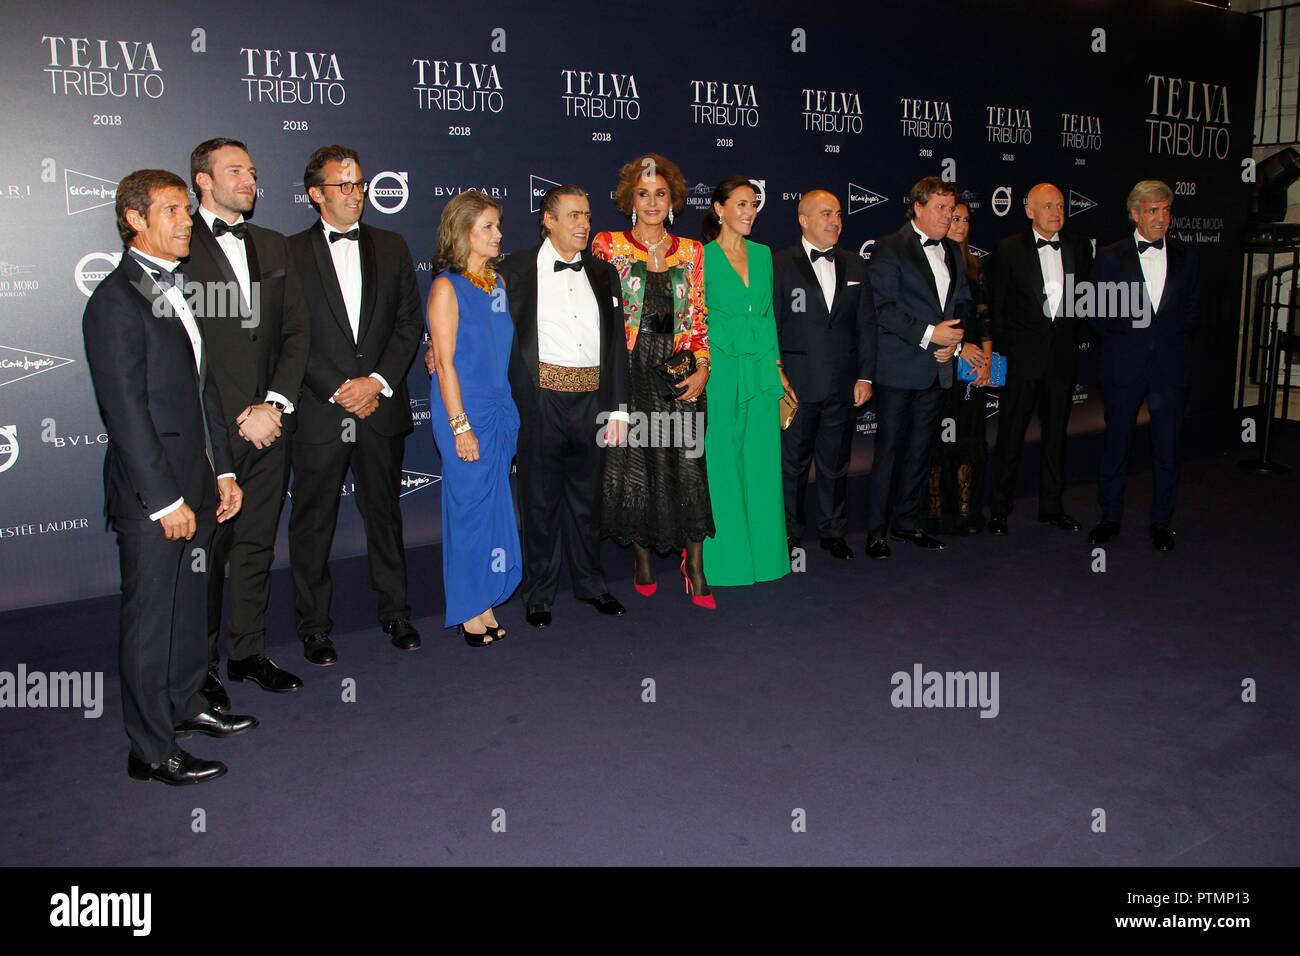 Photocall del homenaje a Naty Abascal, en Madrid. (Photo: Jose Cuesta/261/Cordon Press).   Photocall of 2 edition of Telva Tributo 2018: Una Cronica de Moda. Coleccion Nati Abascal in Madrid on Tuesday , 09 october 2018 - Stock Image